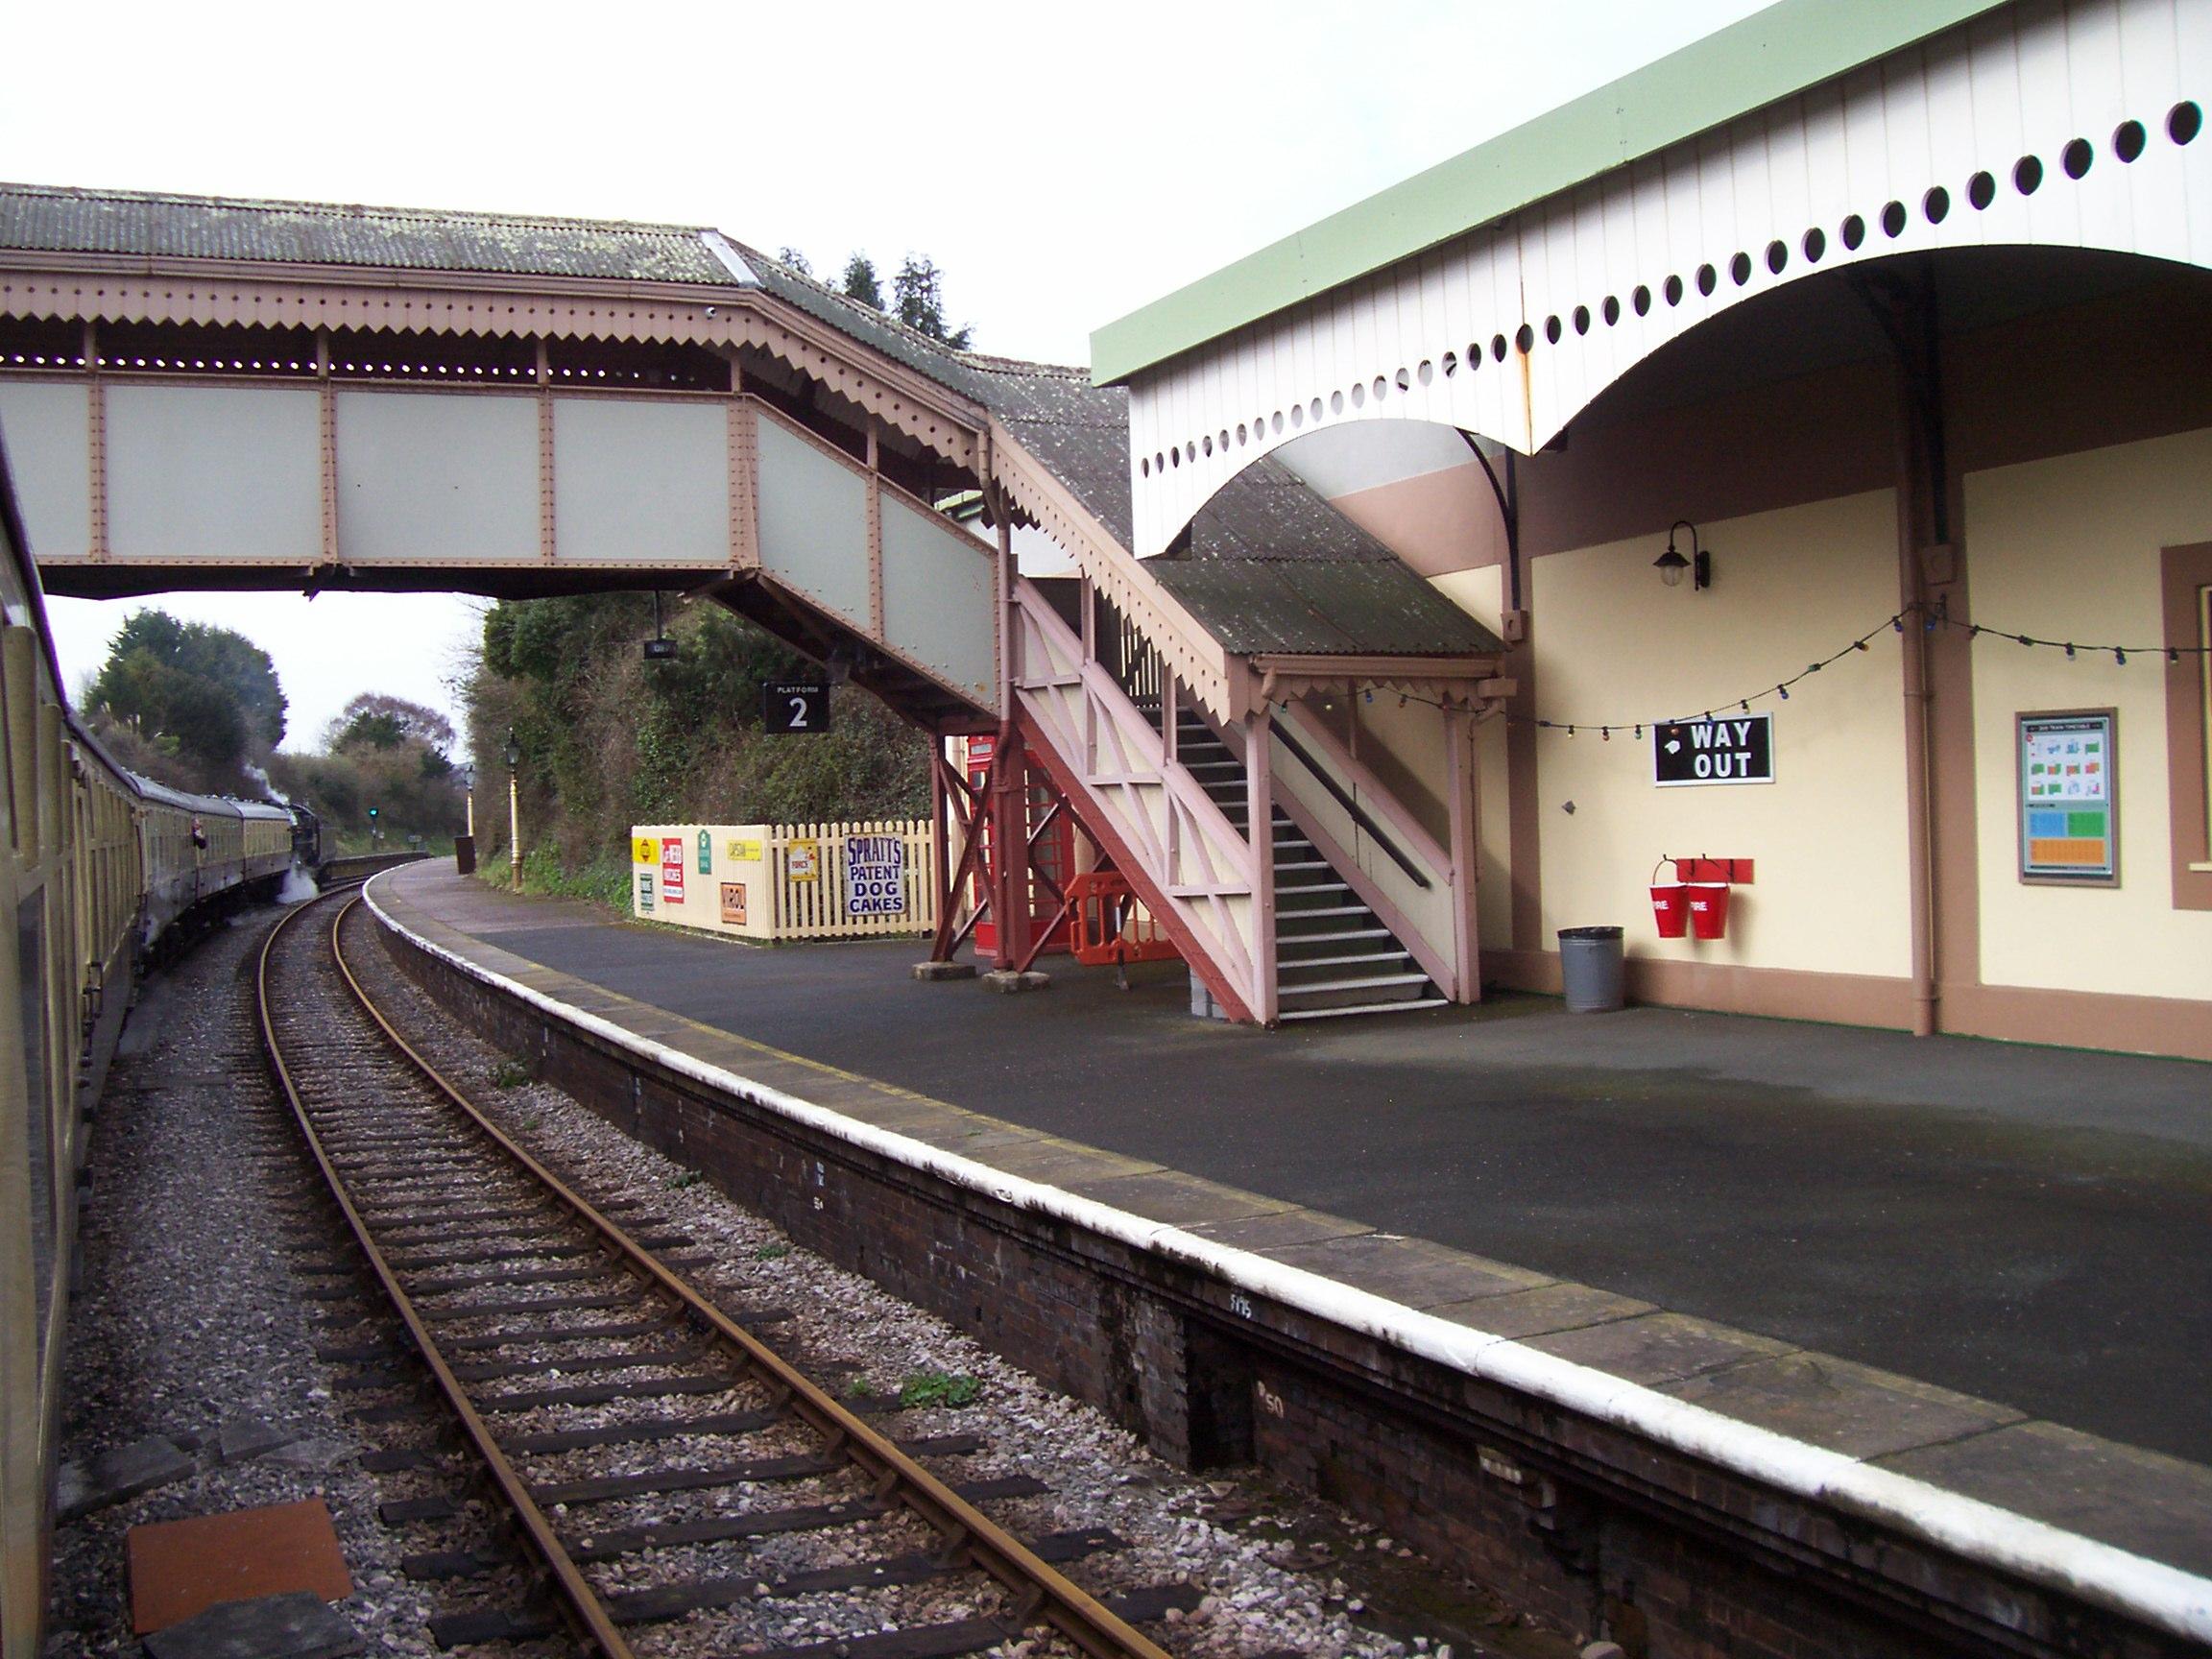 Churston Station and footbridge